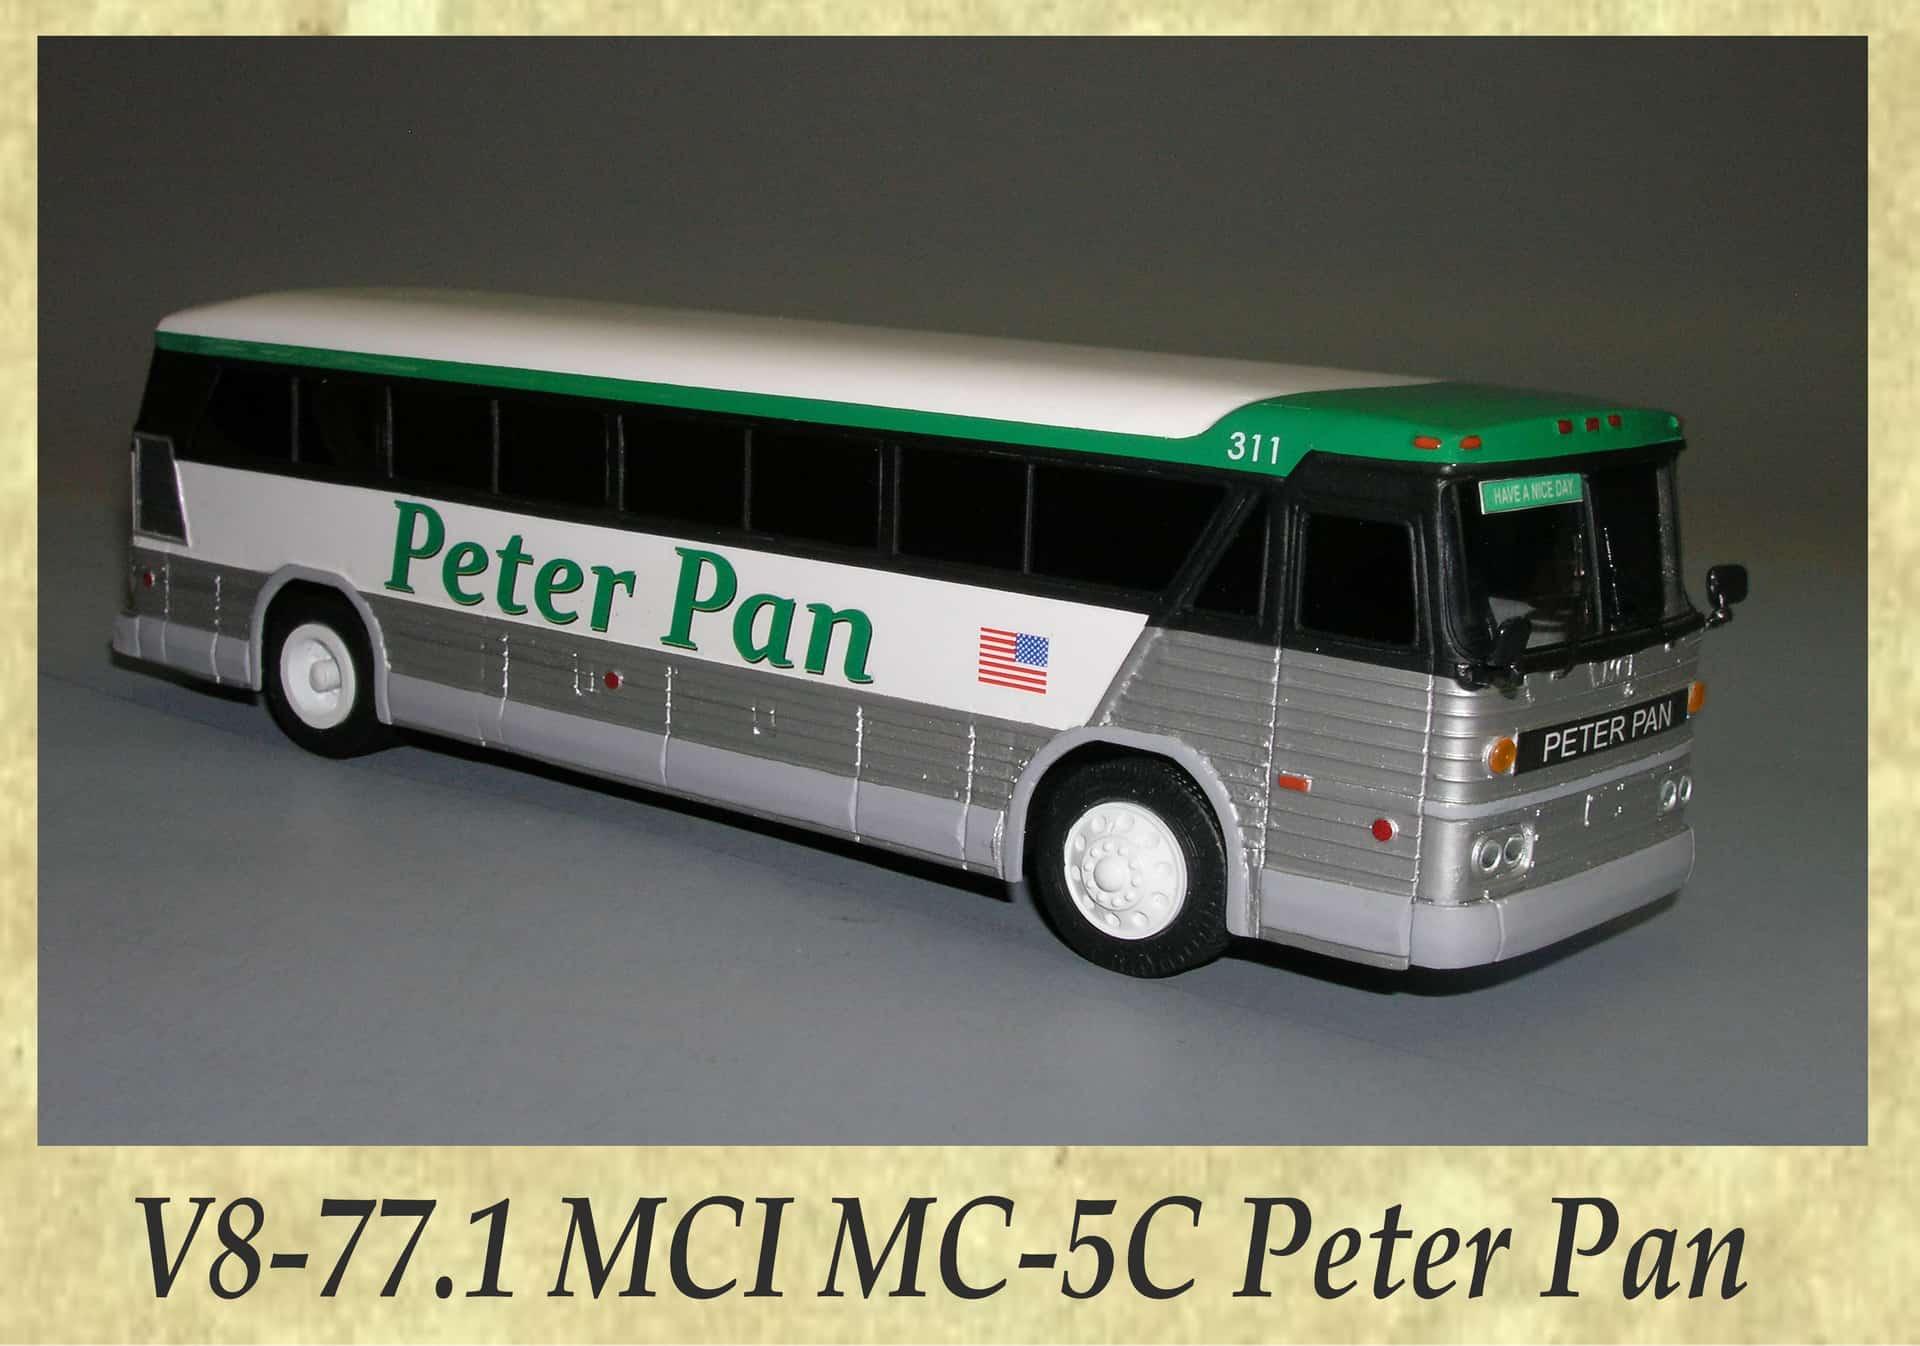 V8-77.1 MCI MC-5C Peter Pan